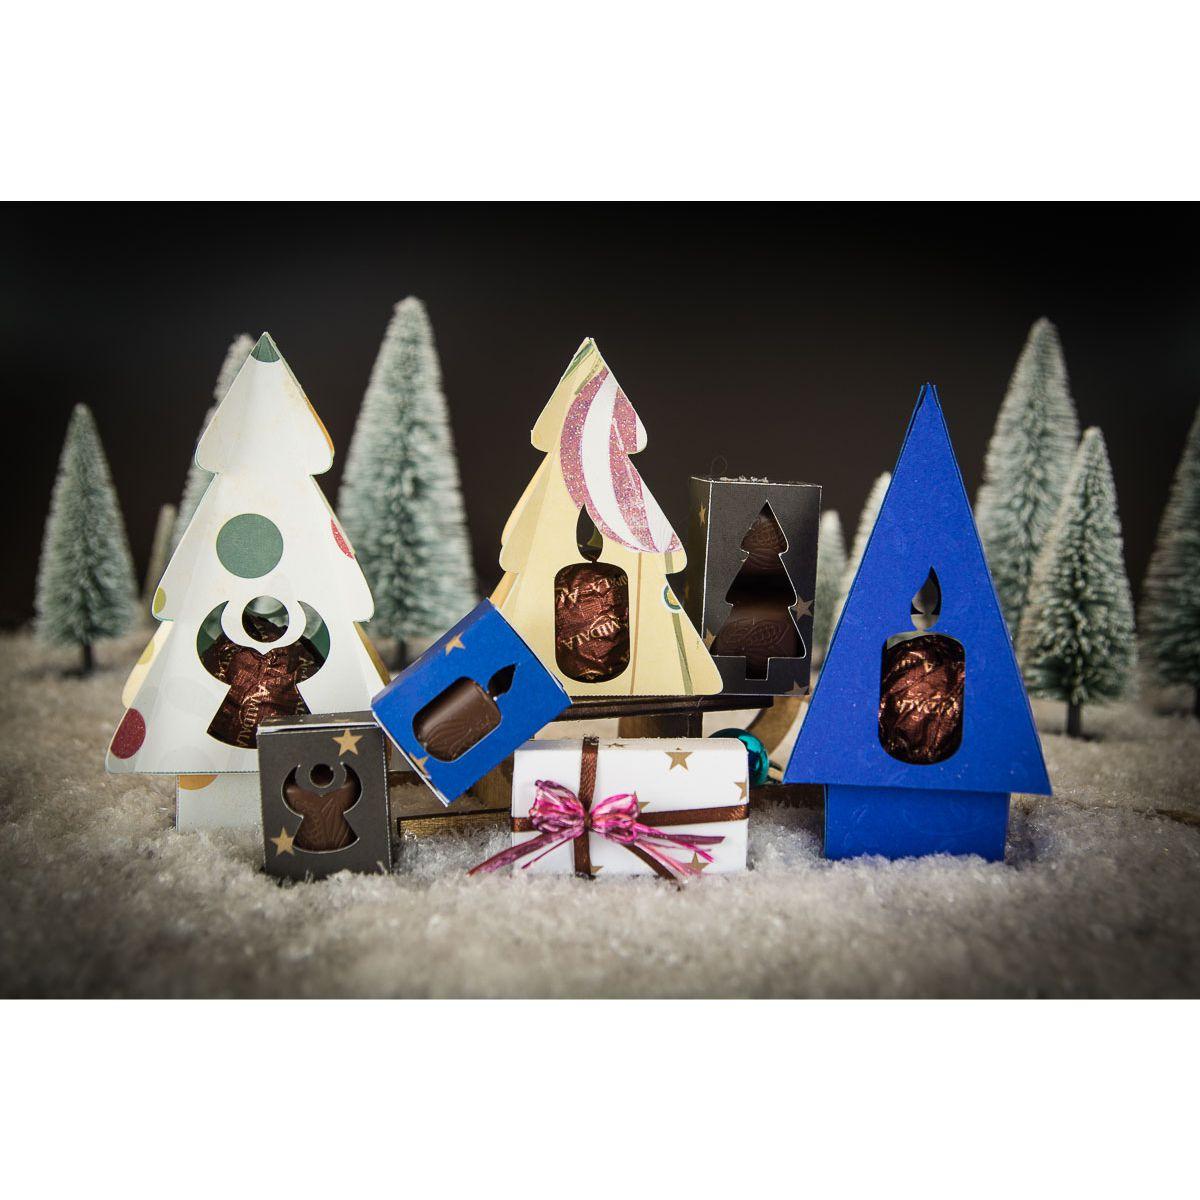 gesamtpaket pralinen geschenkverpackungen weihnachten. Black Bedroom Furniture Sets. Home Design Ideas